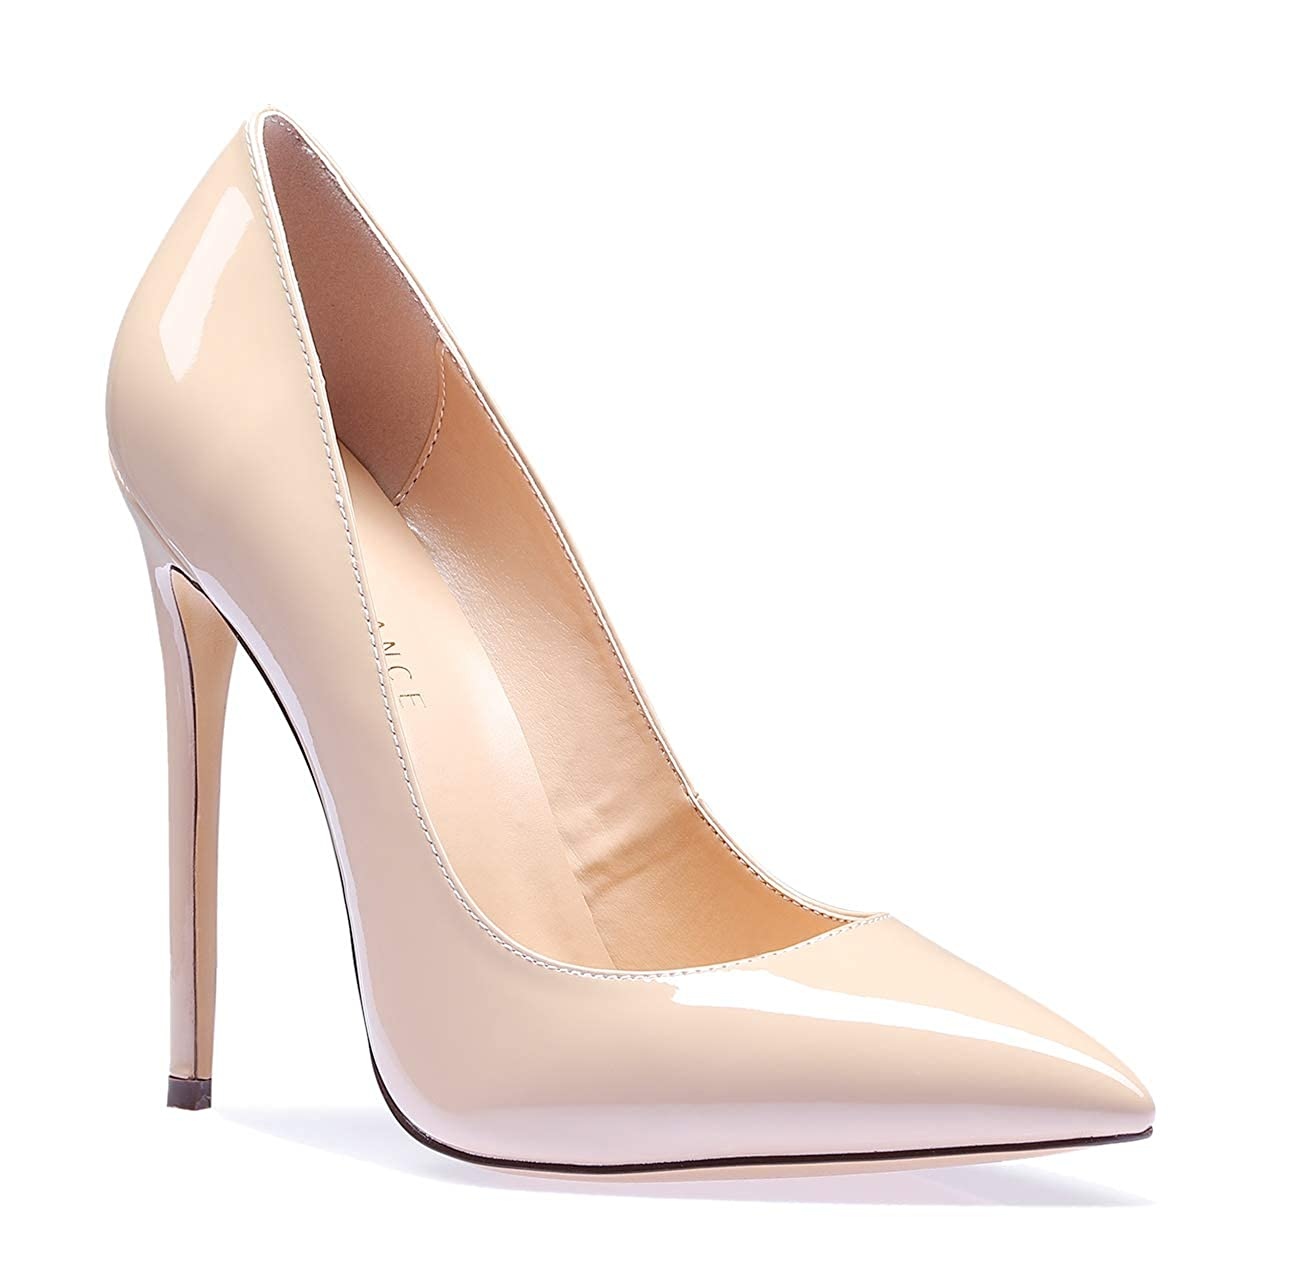 46561253aba SUNETEDANCE Women's Slip-on Pumps High Heels Pointy Toe Sexy Elegant  Stiletto Heels 12CM Heel Shoes